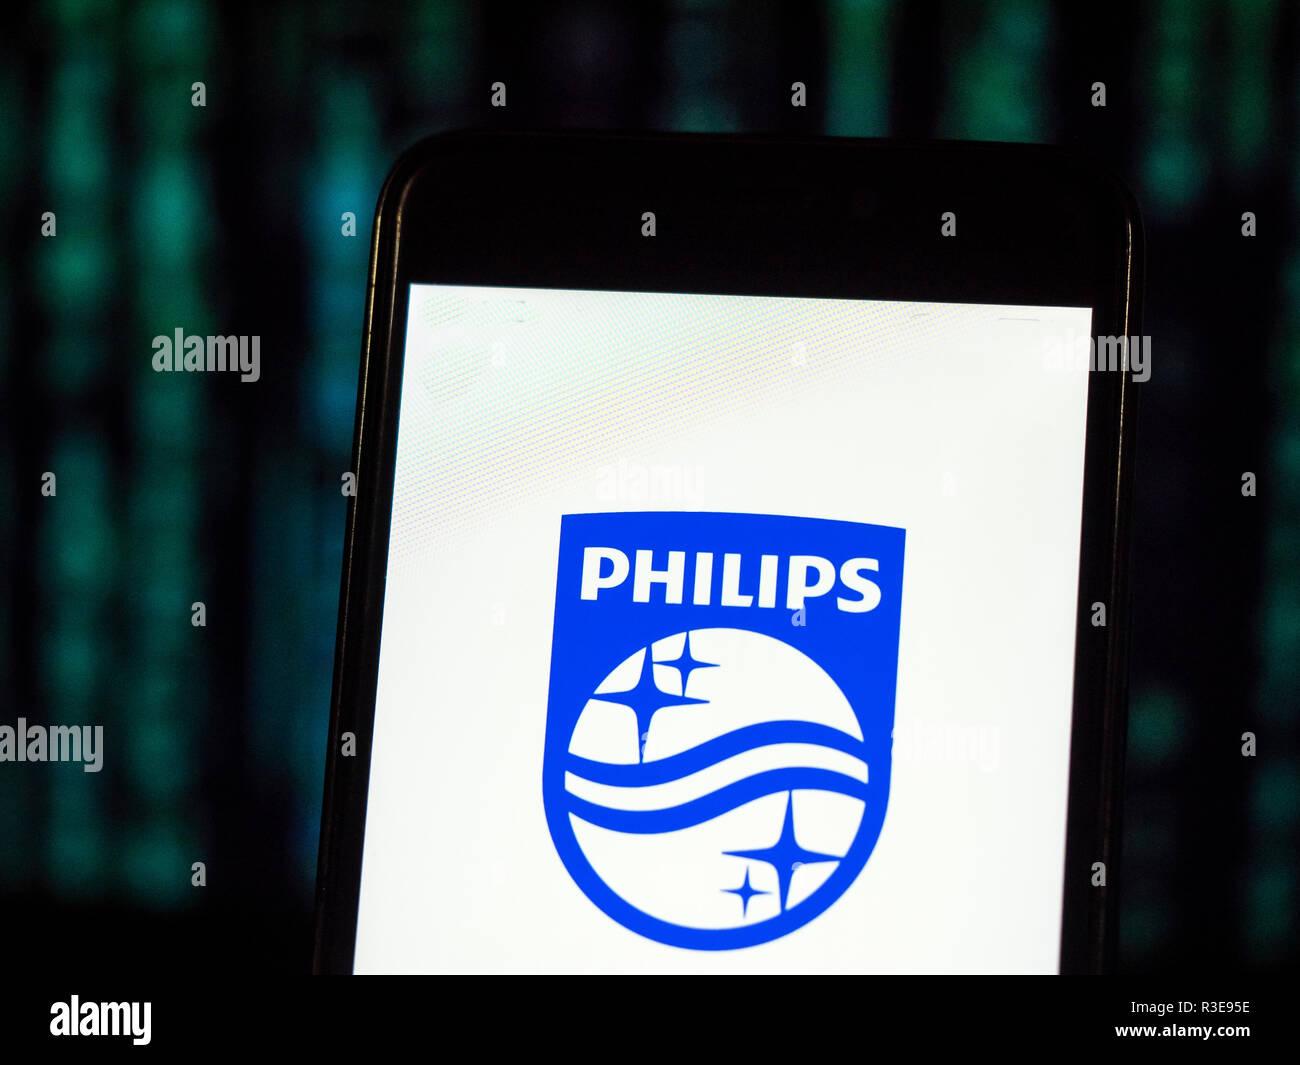 Koninklijke Philips N.V. Multinational conglomerate company  logo seen displayed on smart phone. - Stock Image